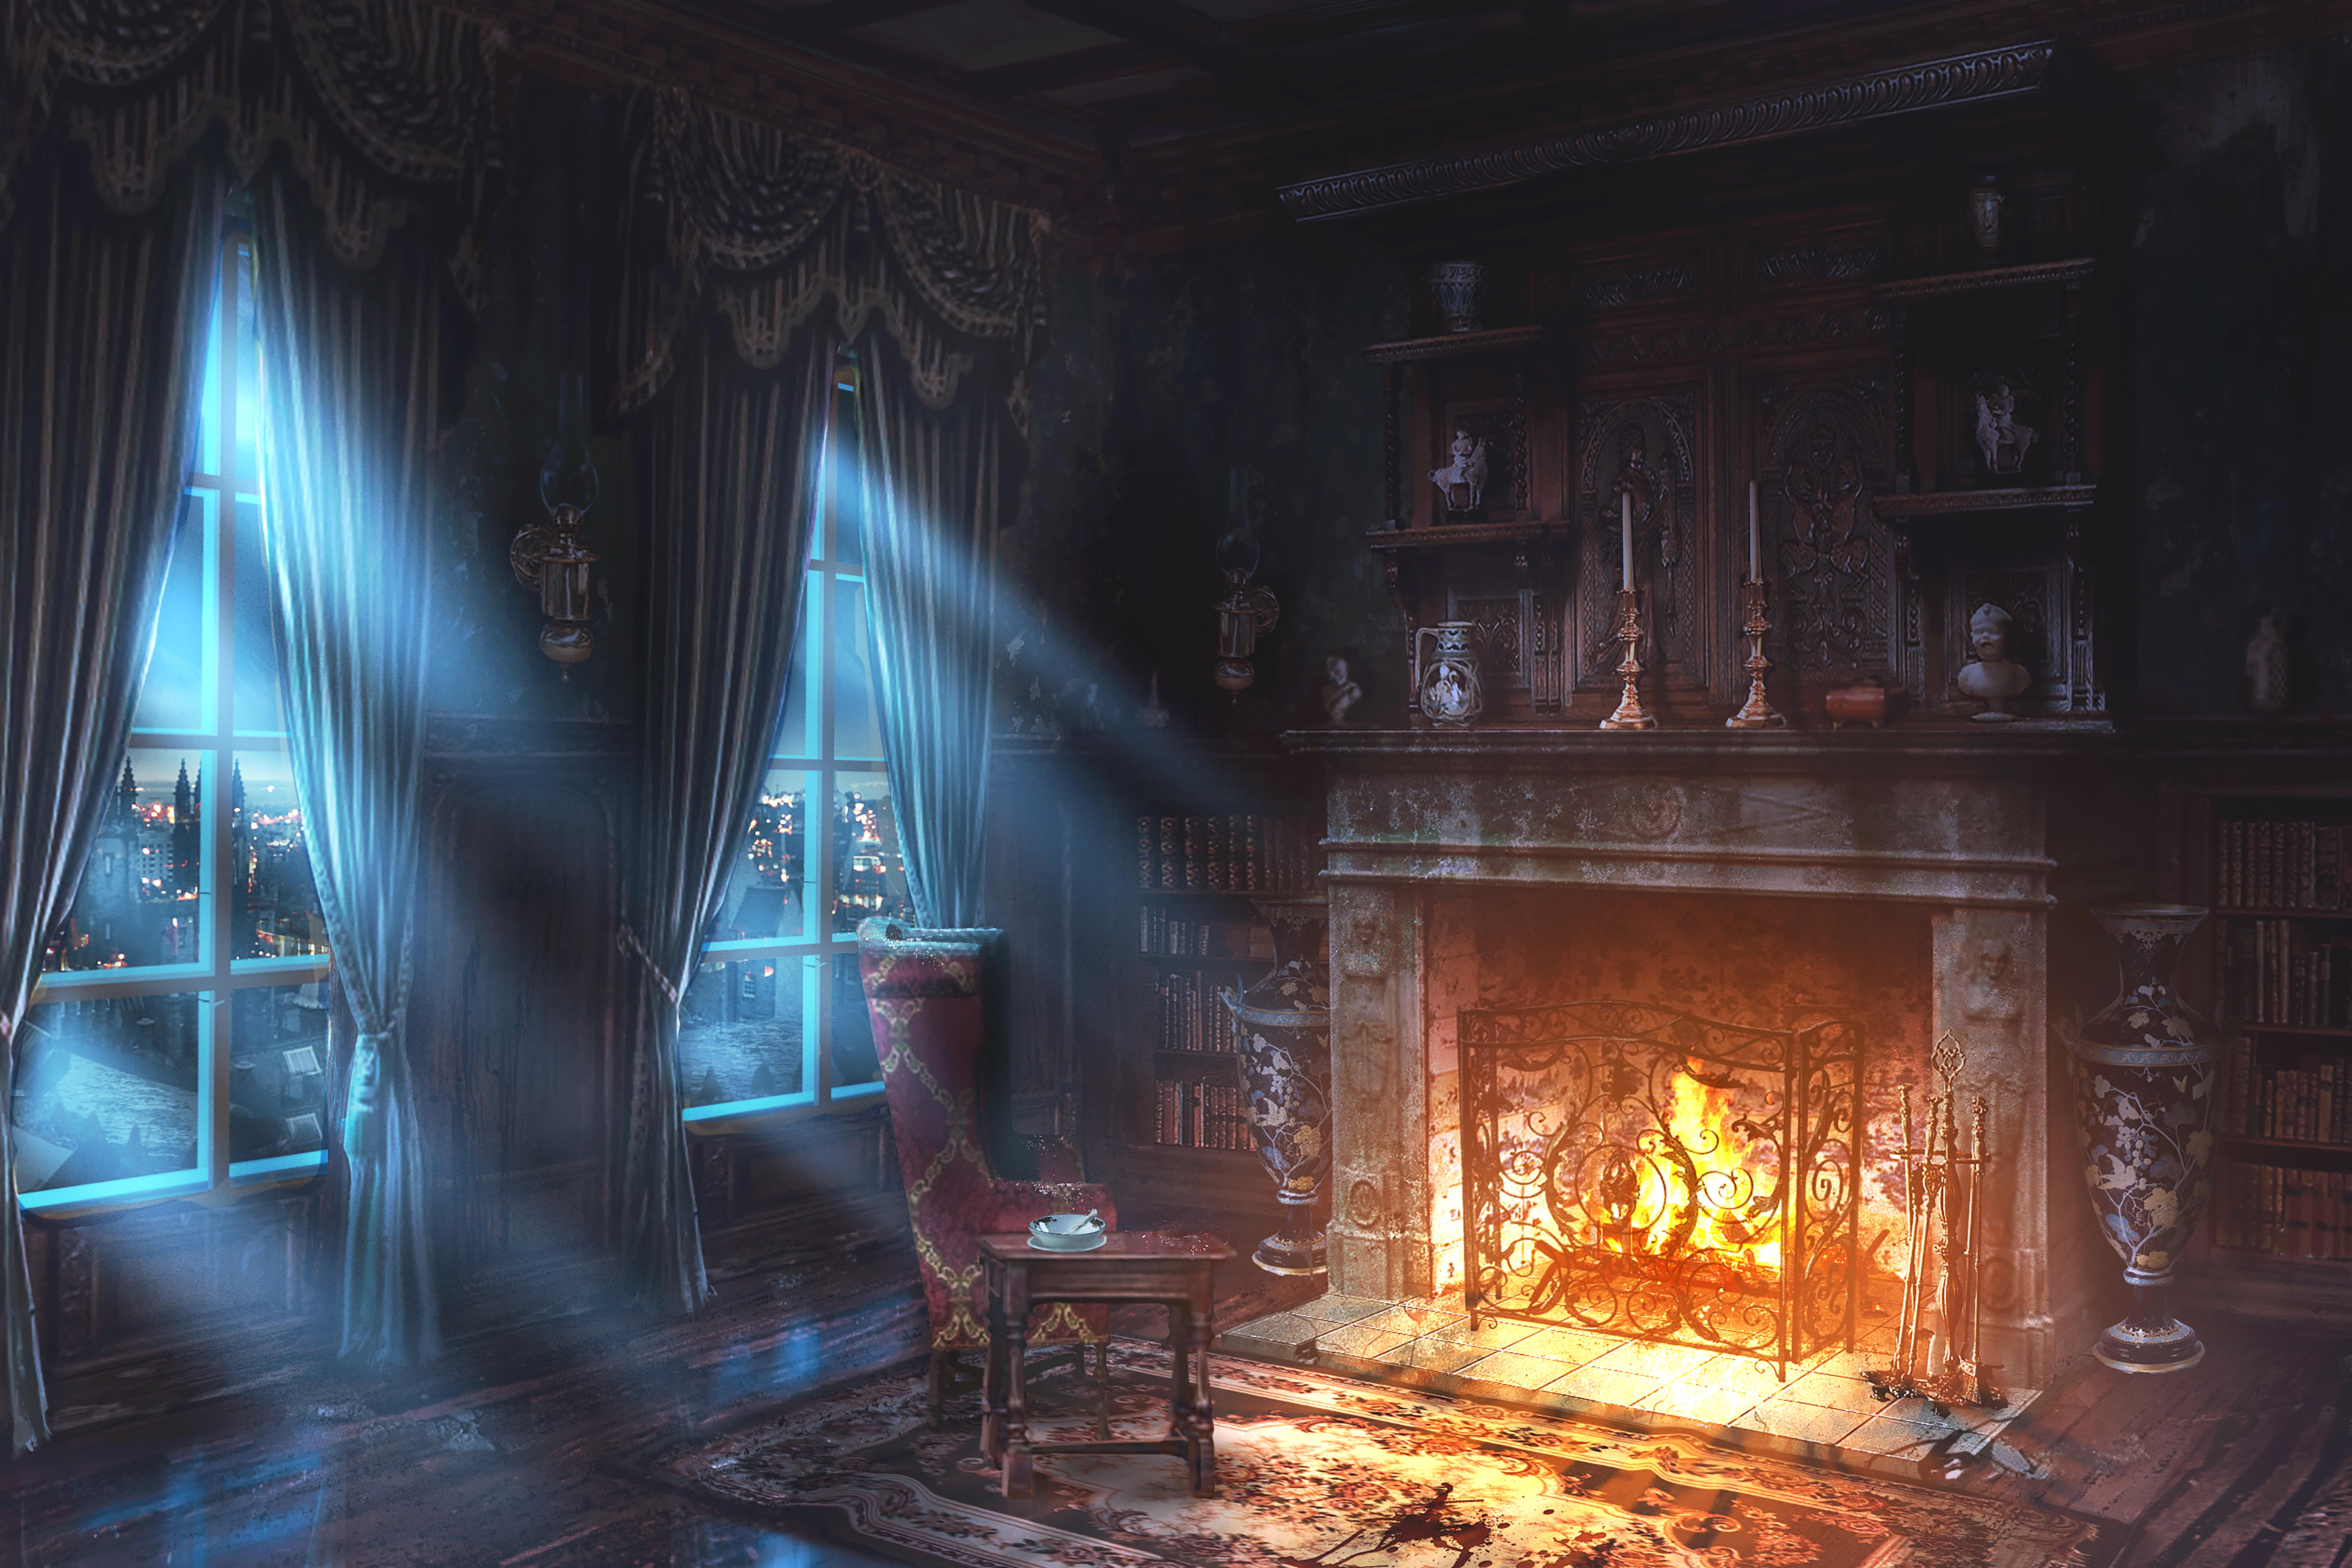 ASC_Chained_fireplace_v08.jpg